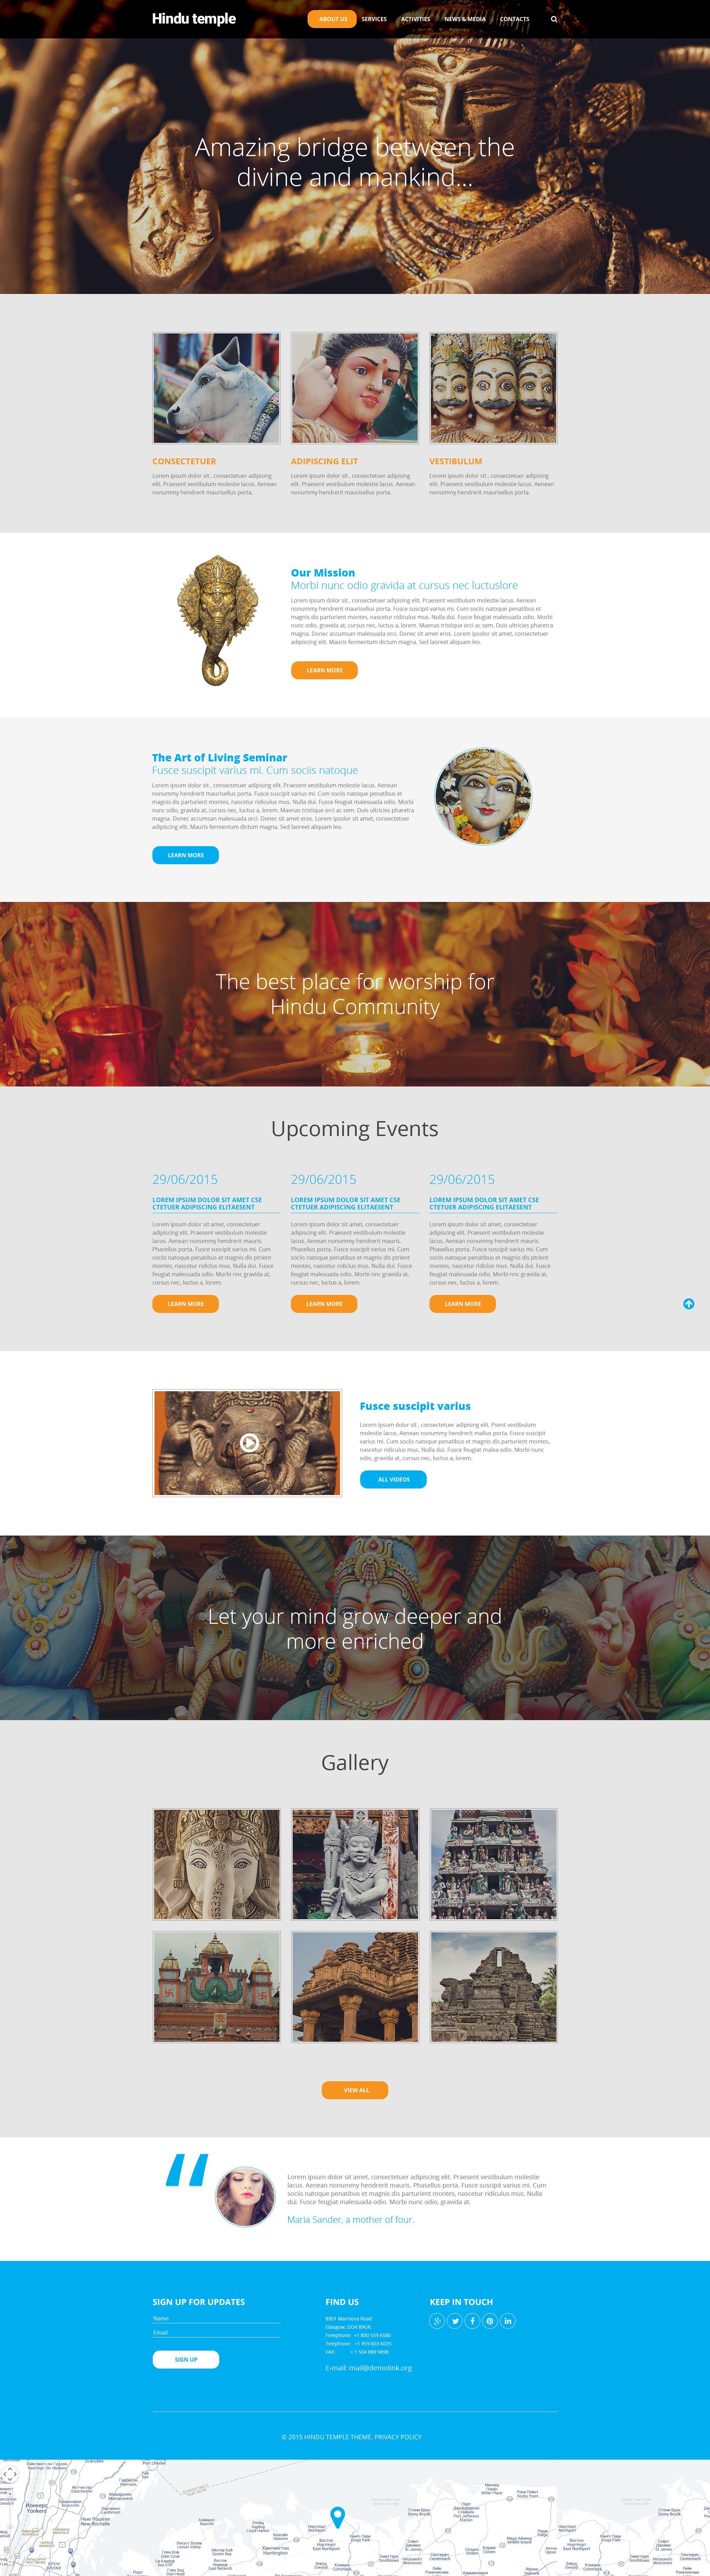 Plantilla Web #56030 para Sitio de Hinduismo